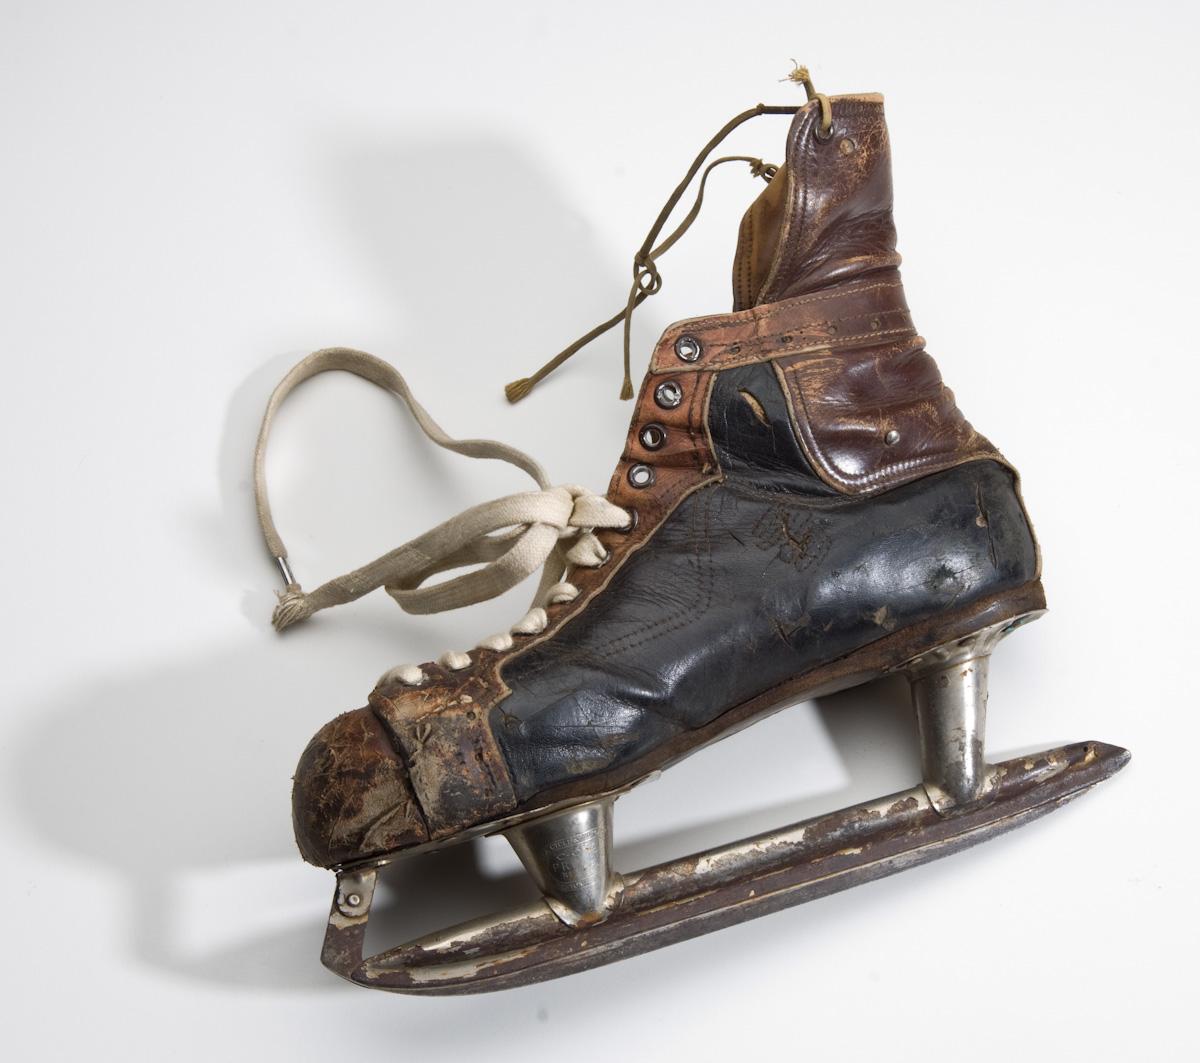 1934 CCM Prolight Hockey Skates